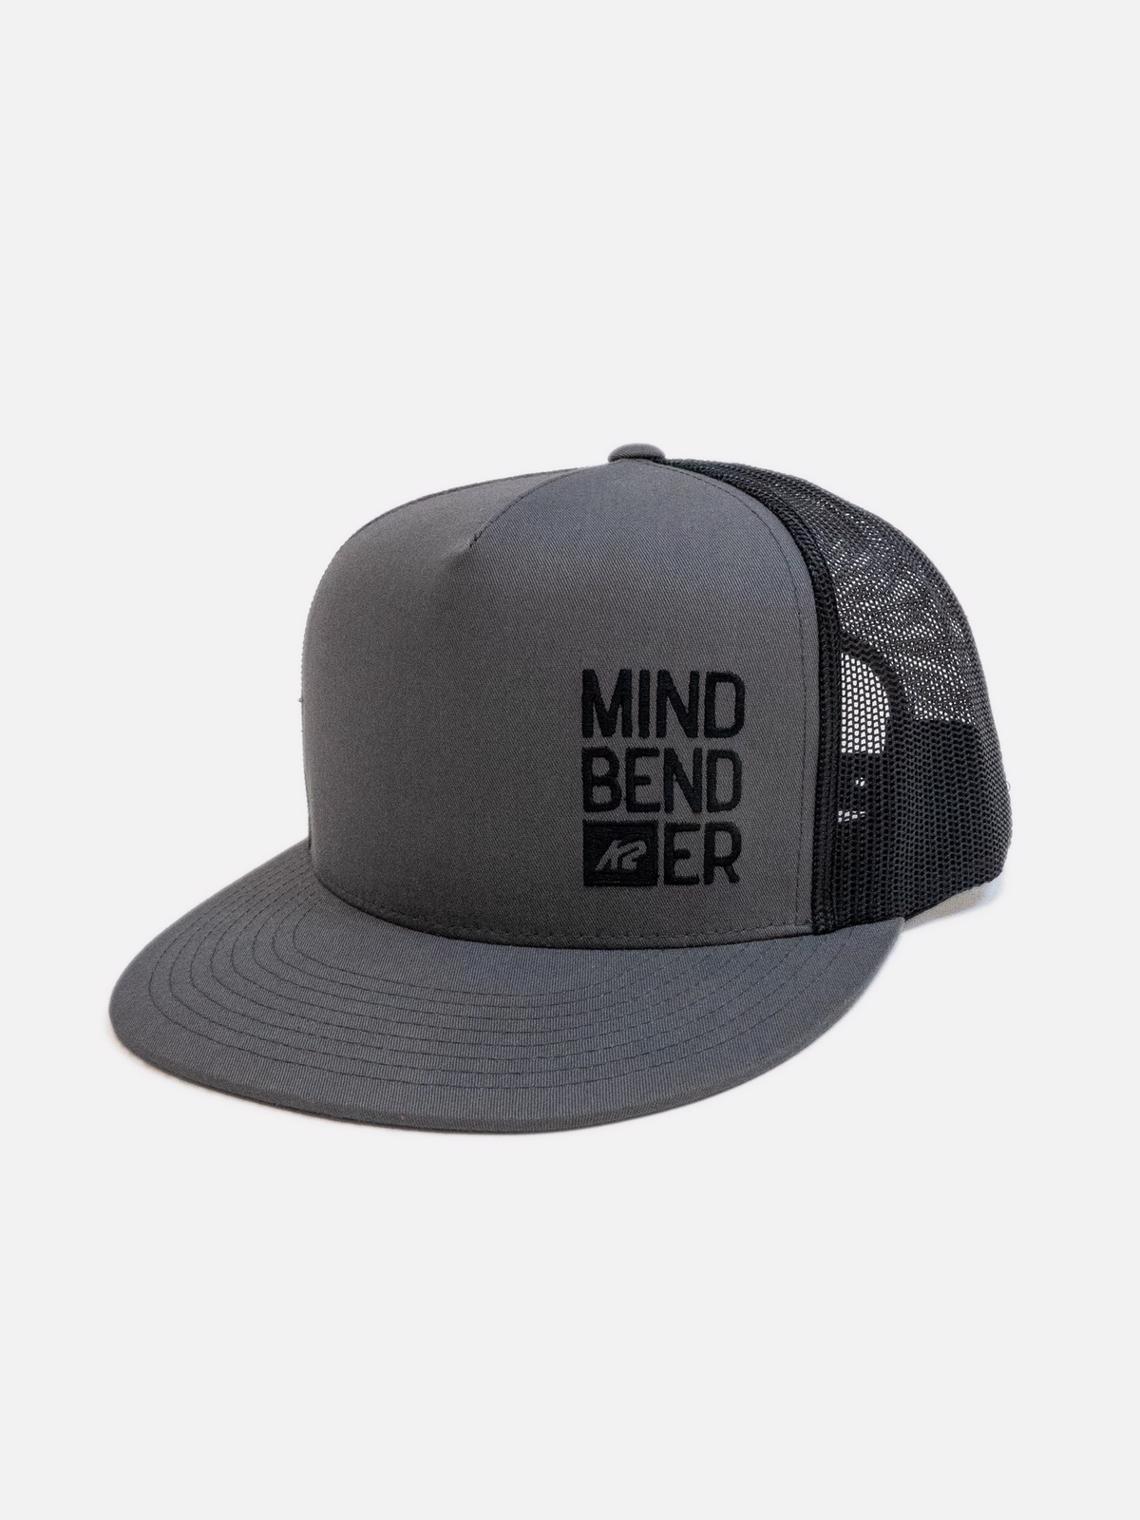 K2 Mindbender Trucker Hat